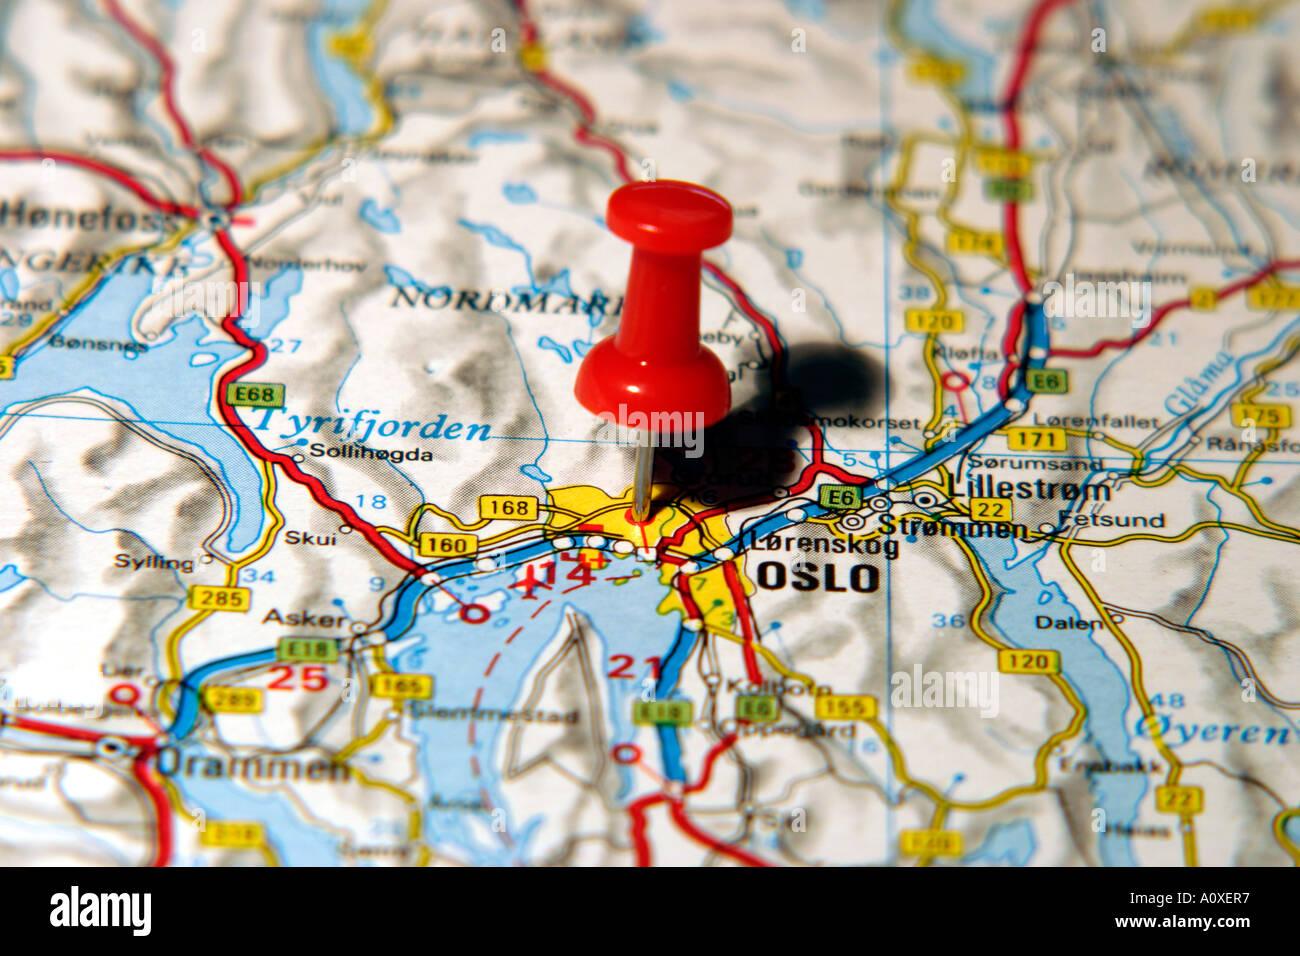 Oslo Map Stock Photos & Oslo Map Stock Images - Alamy Detailed Map Of Neska on